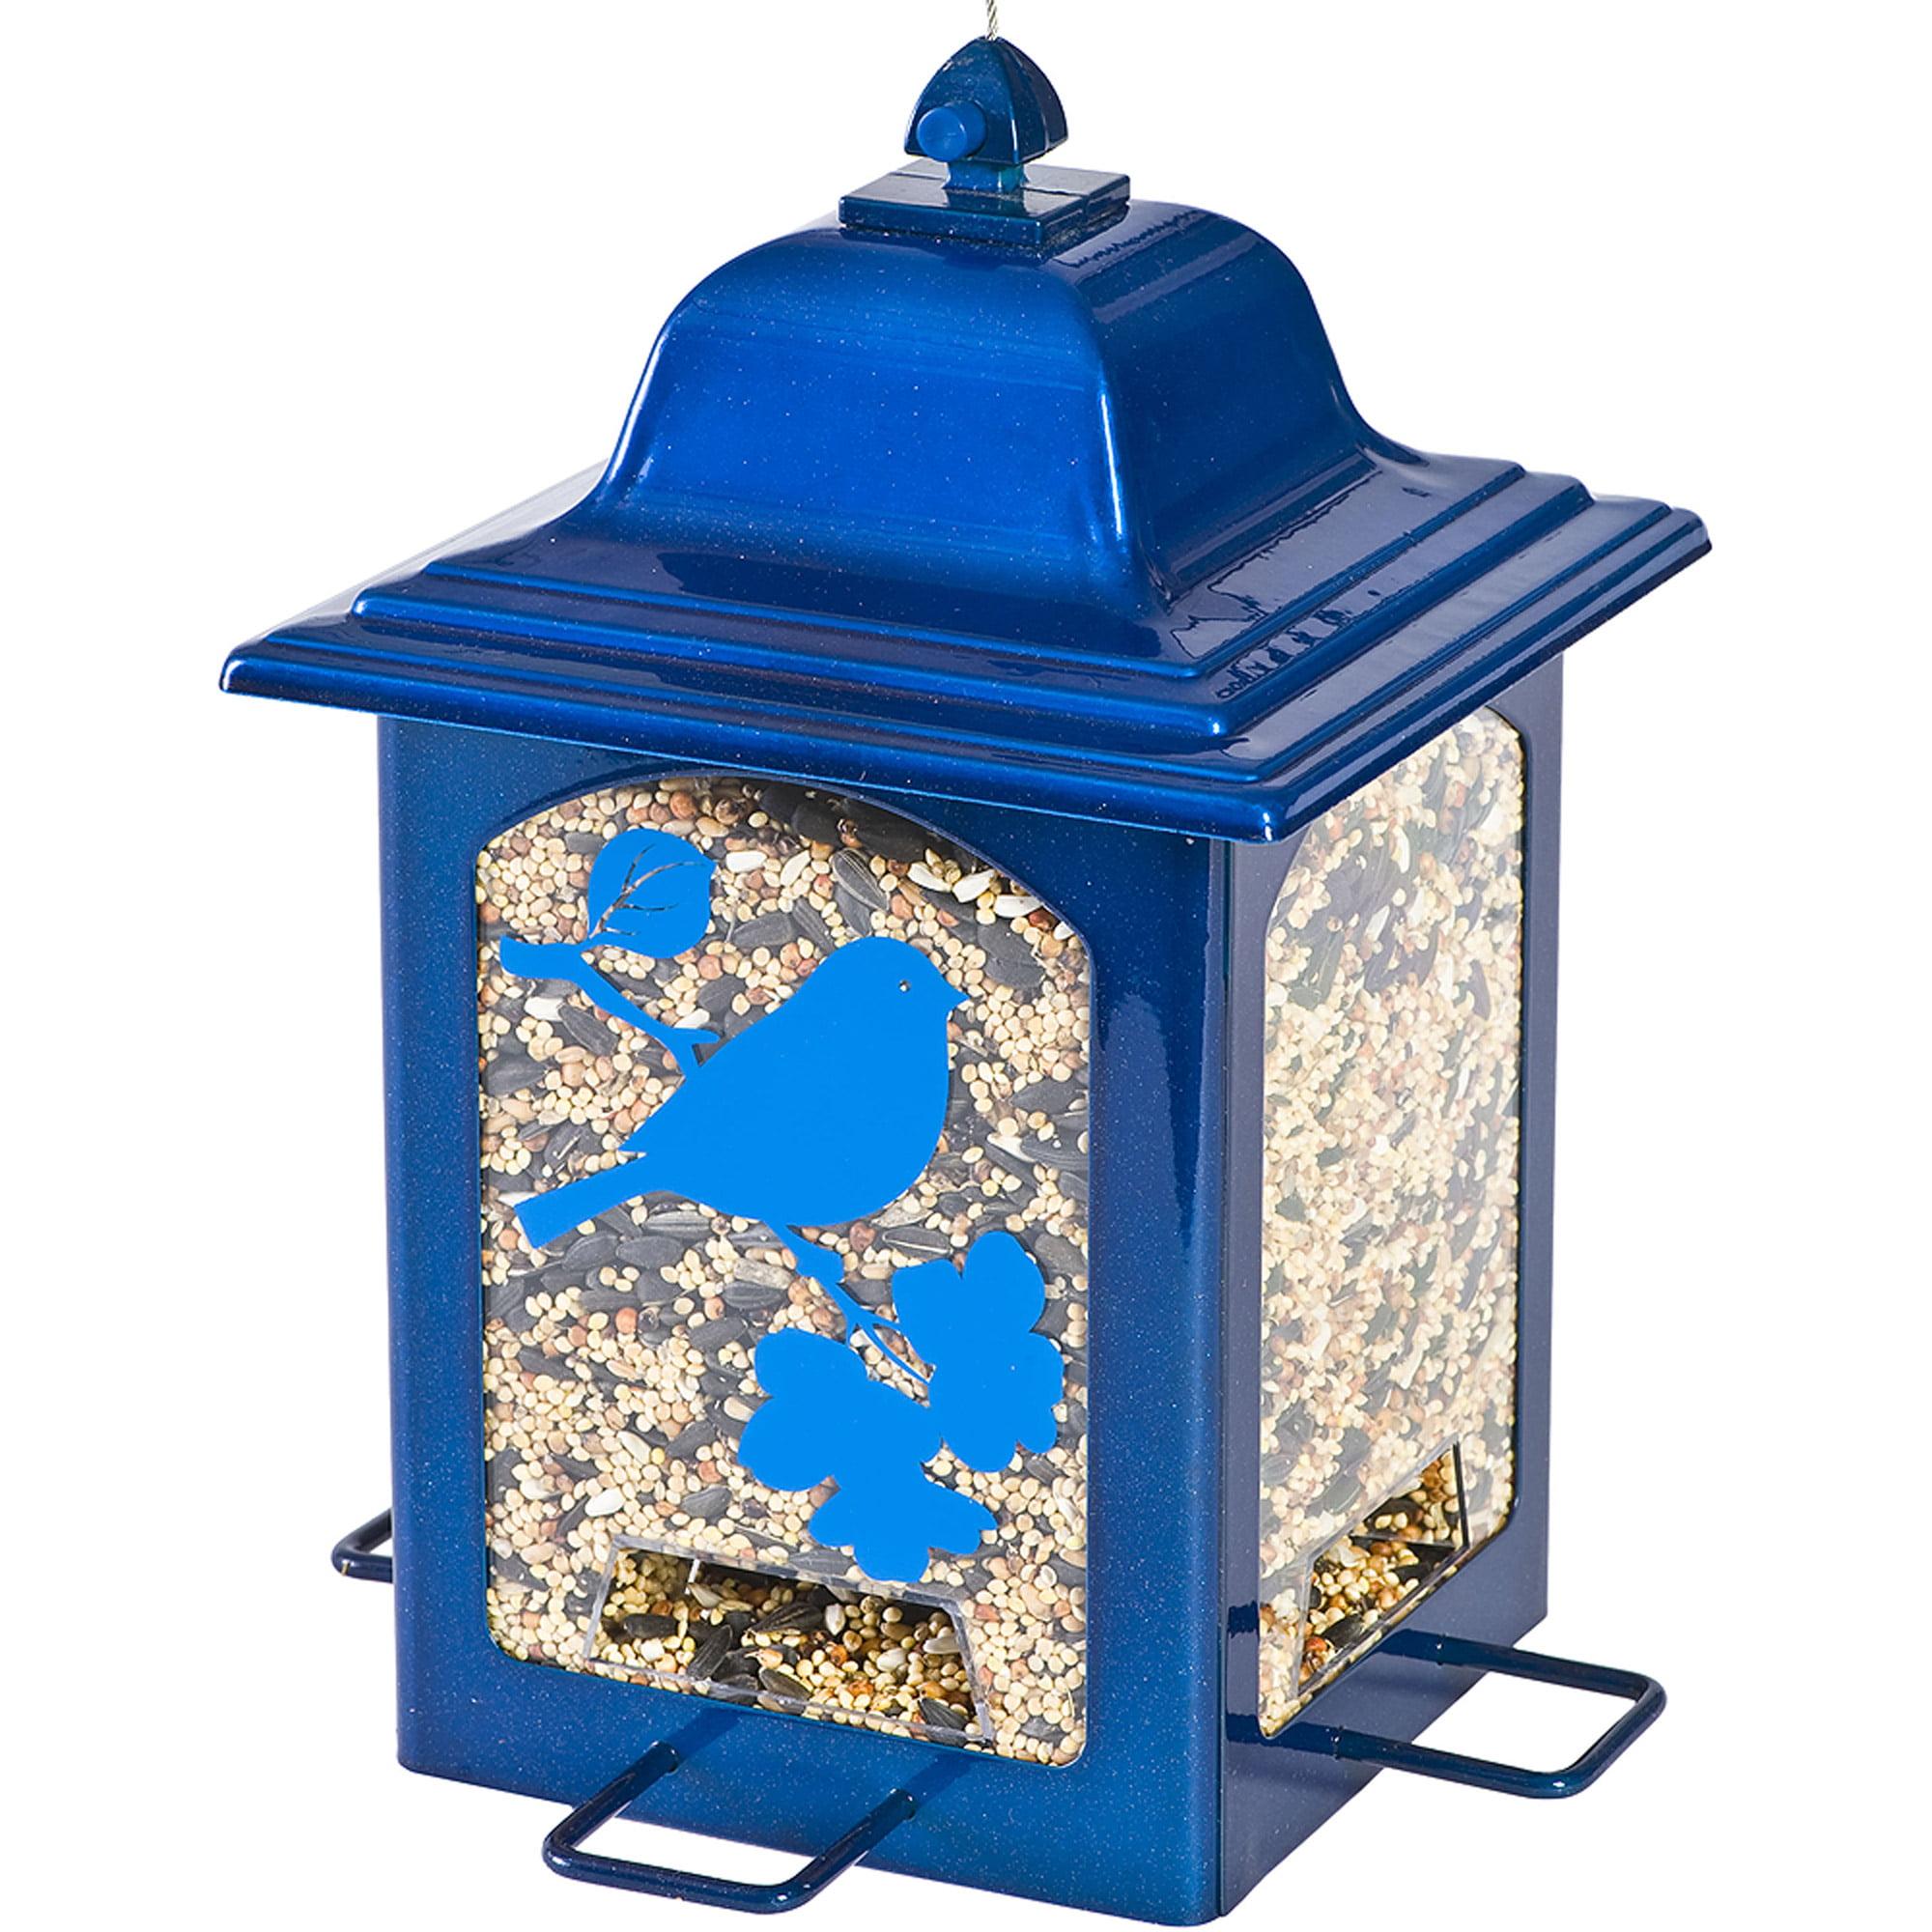 Perky-Pet Blue Sparkle Lantern Wild Birdfeeder by Perky-Pet